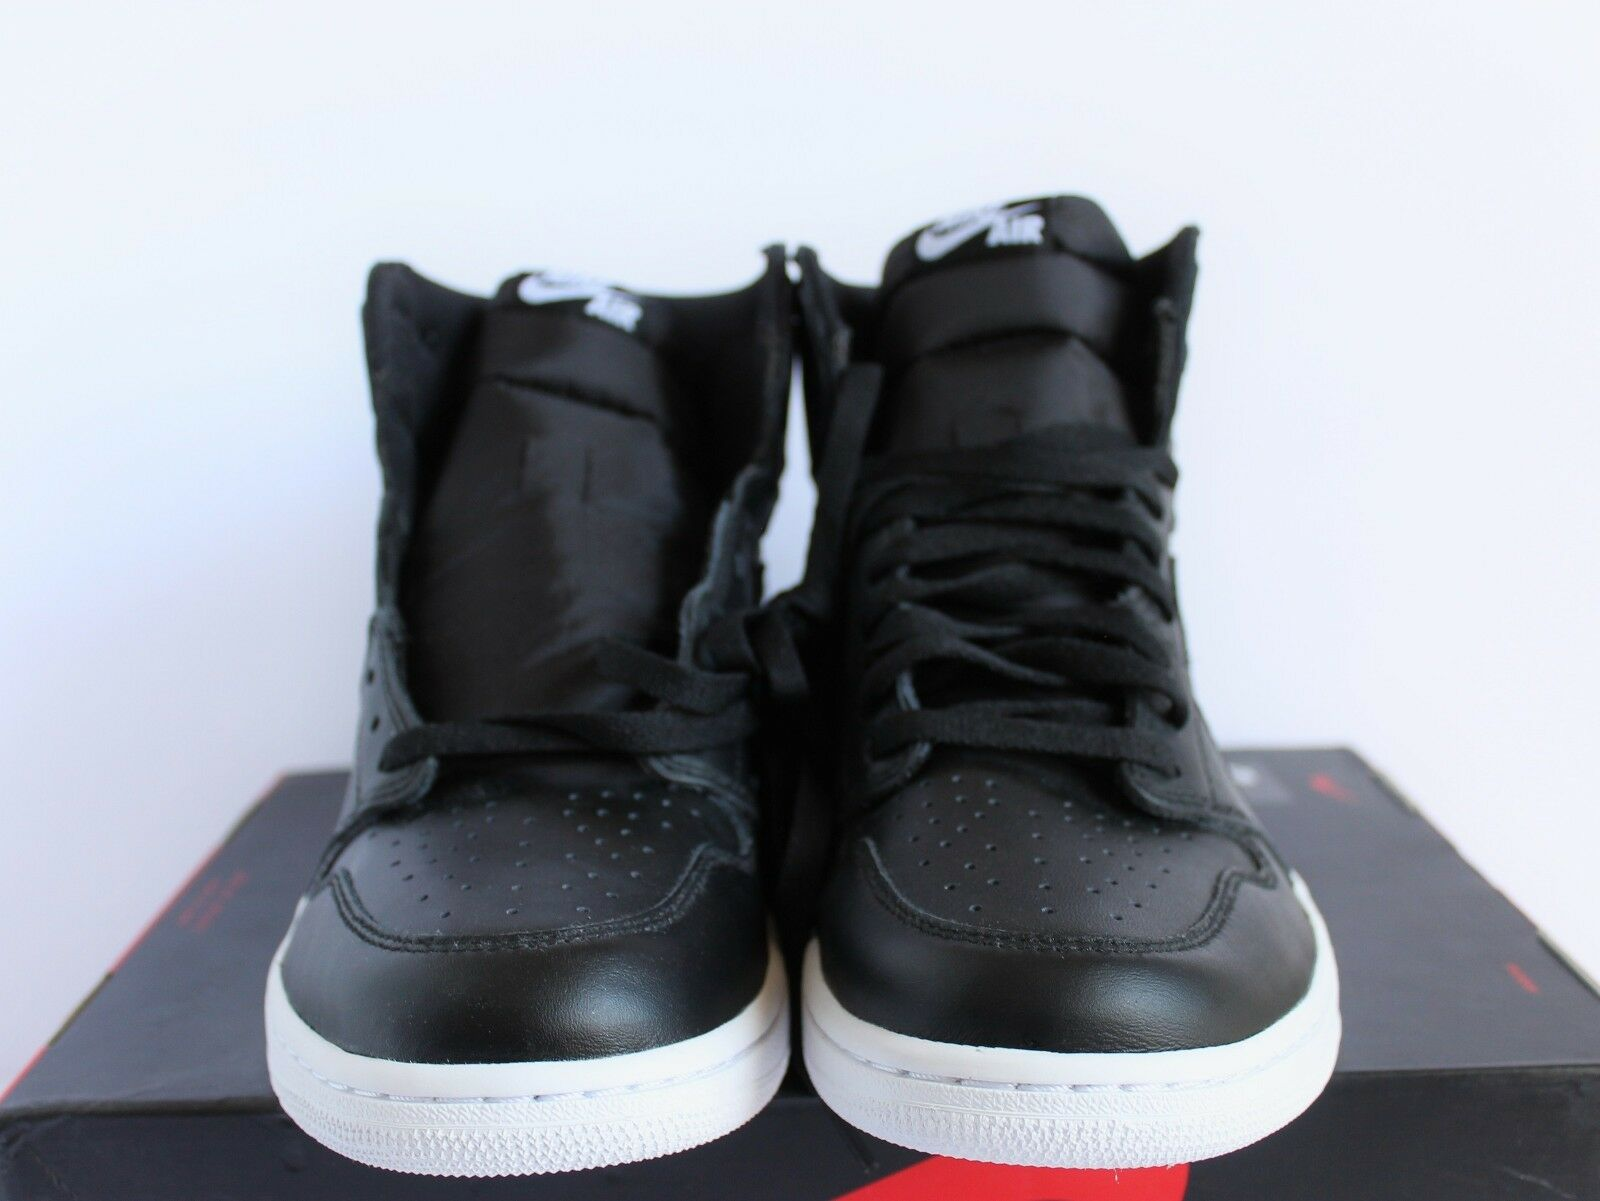 Air Bianco Og 1 Nike Cyber Jordan Lunedì Nero 'uomini Alto eHYb2WIE9D